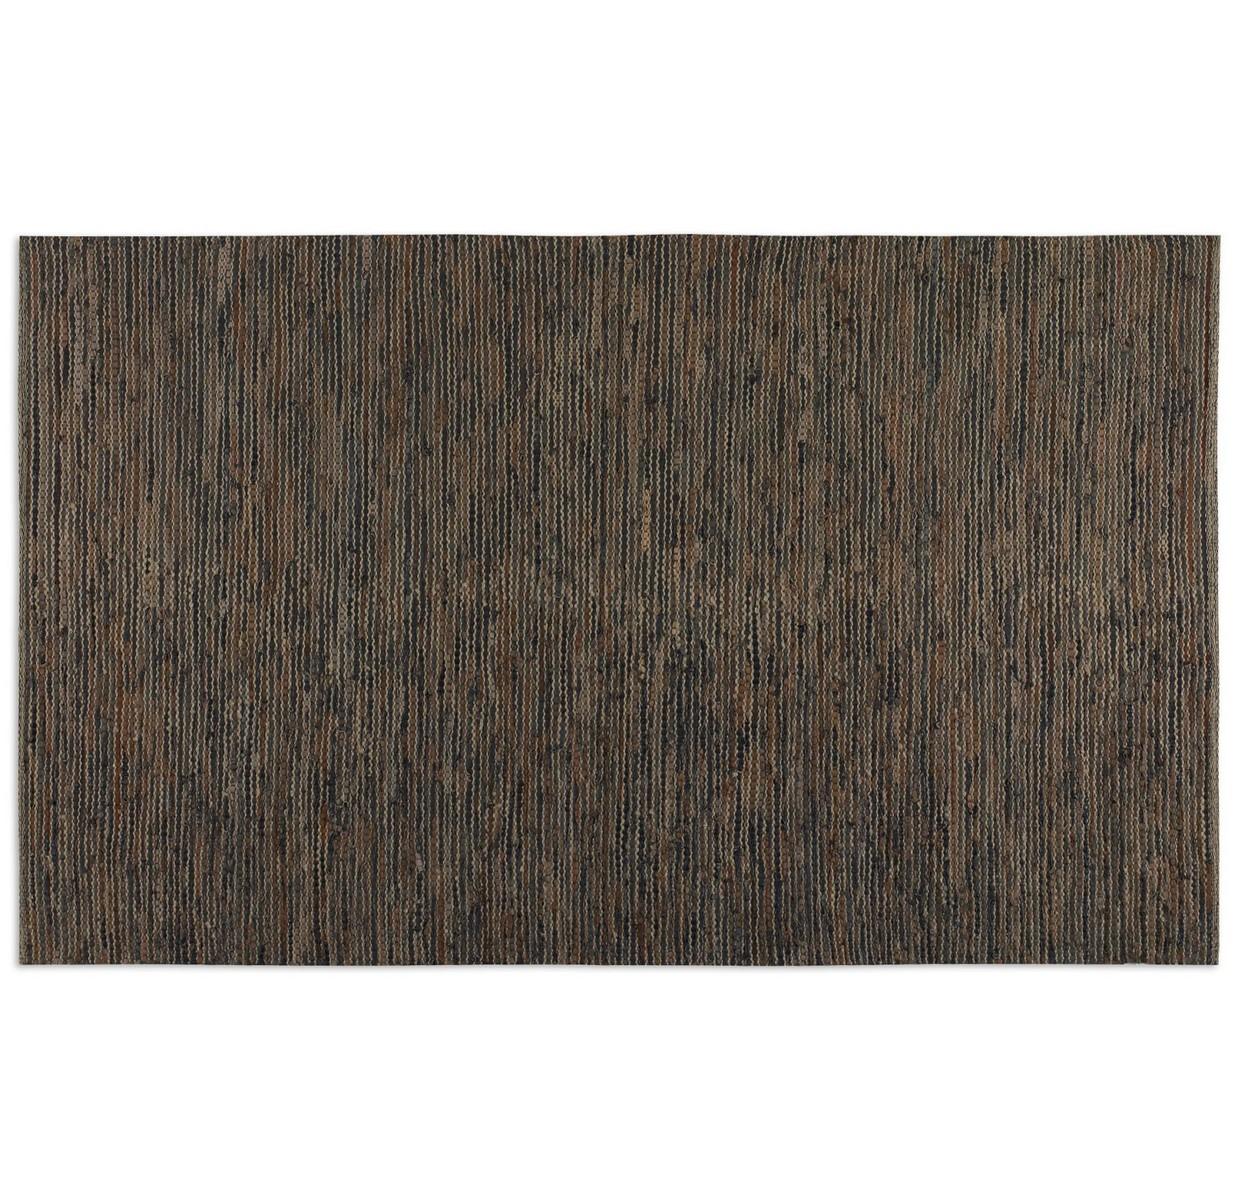 Uttermost Culver 9 X 12 Rug - Brown Rust